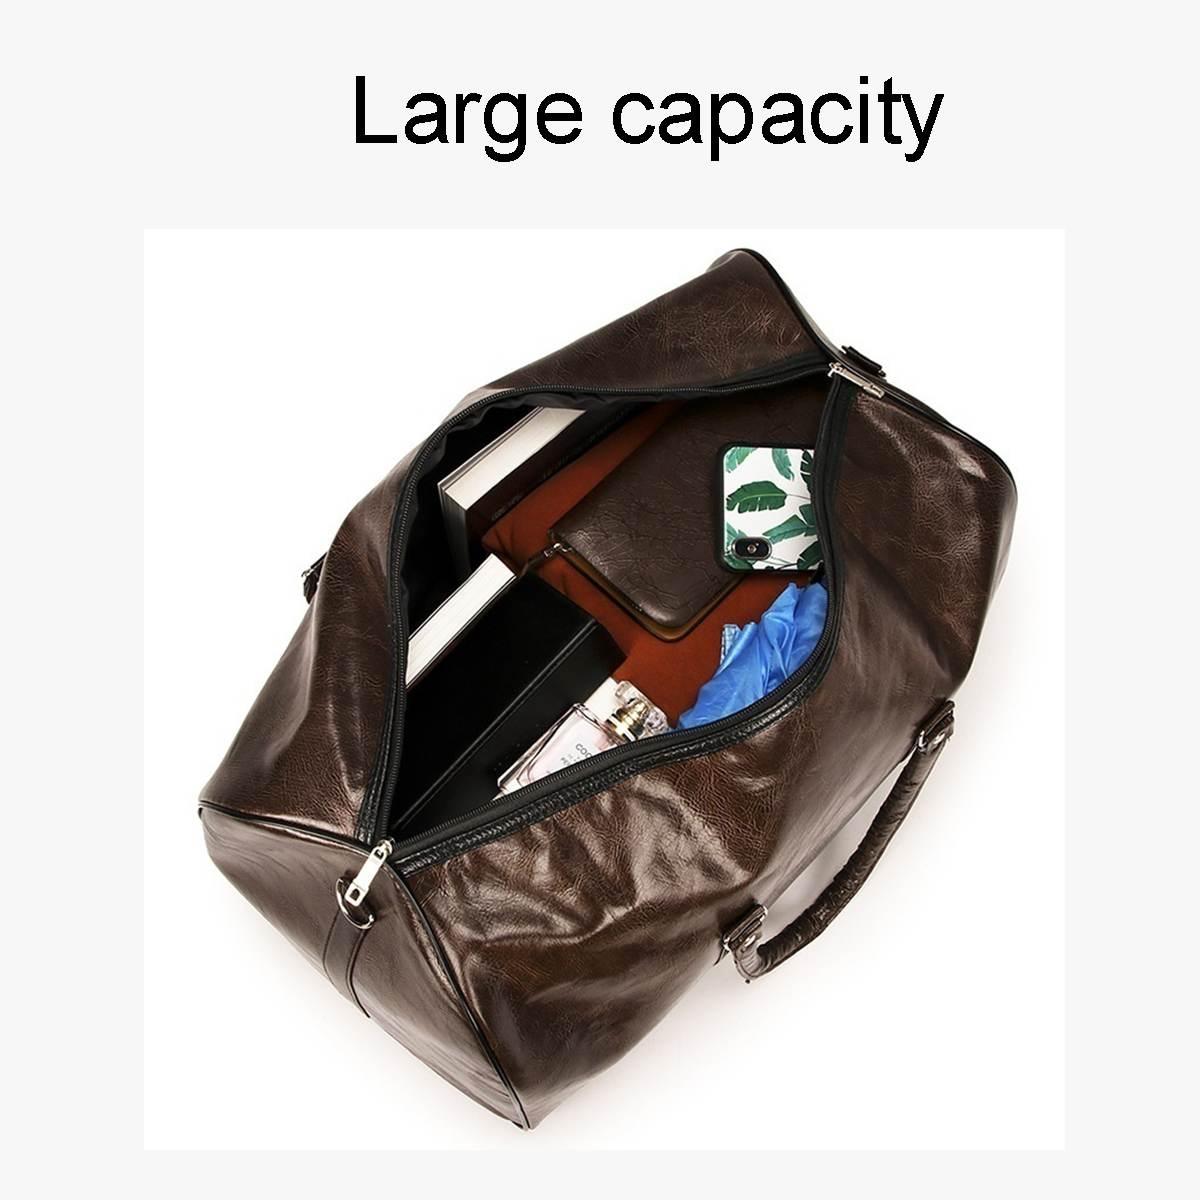 Travel Luggage Duffle Bag Lightweight Portable Handbag Fantasy Lake Print Large Capacity Waterproof Foldable Storage Tote